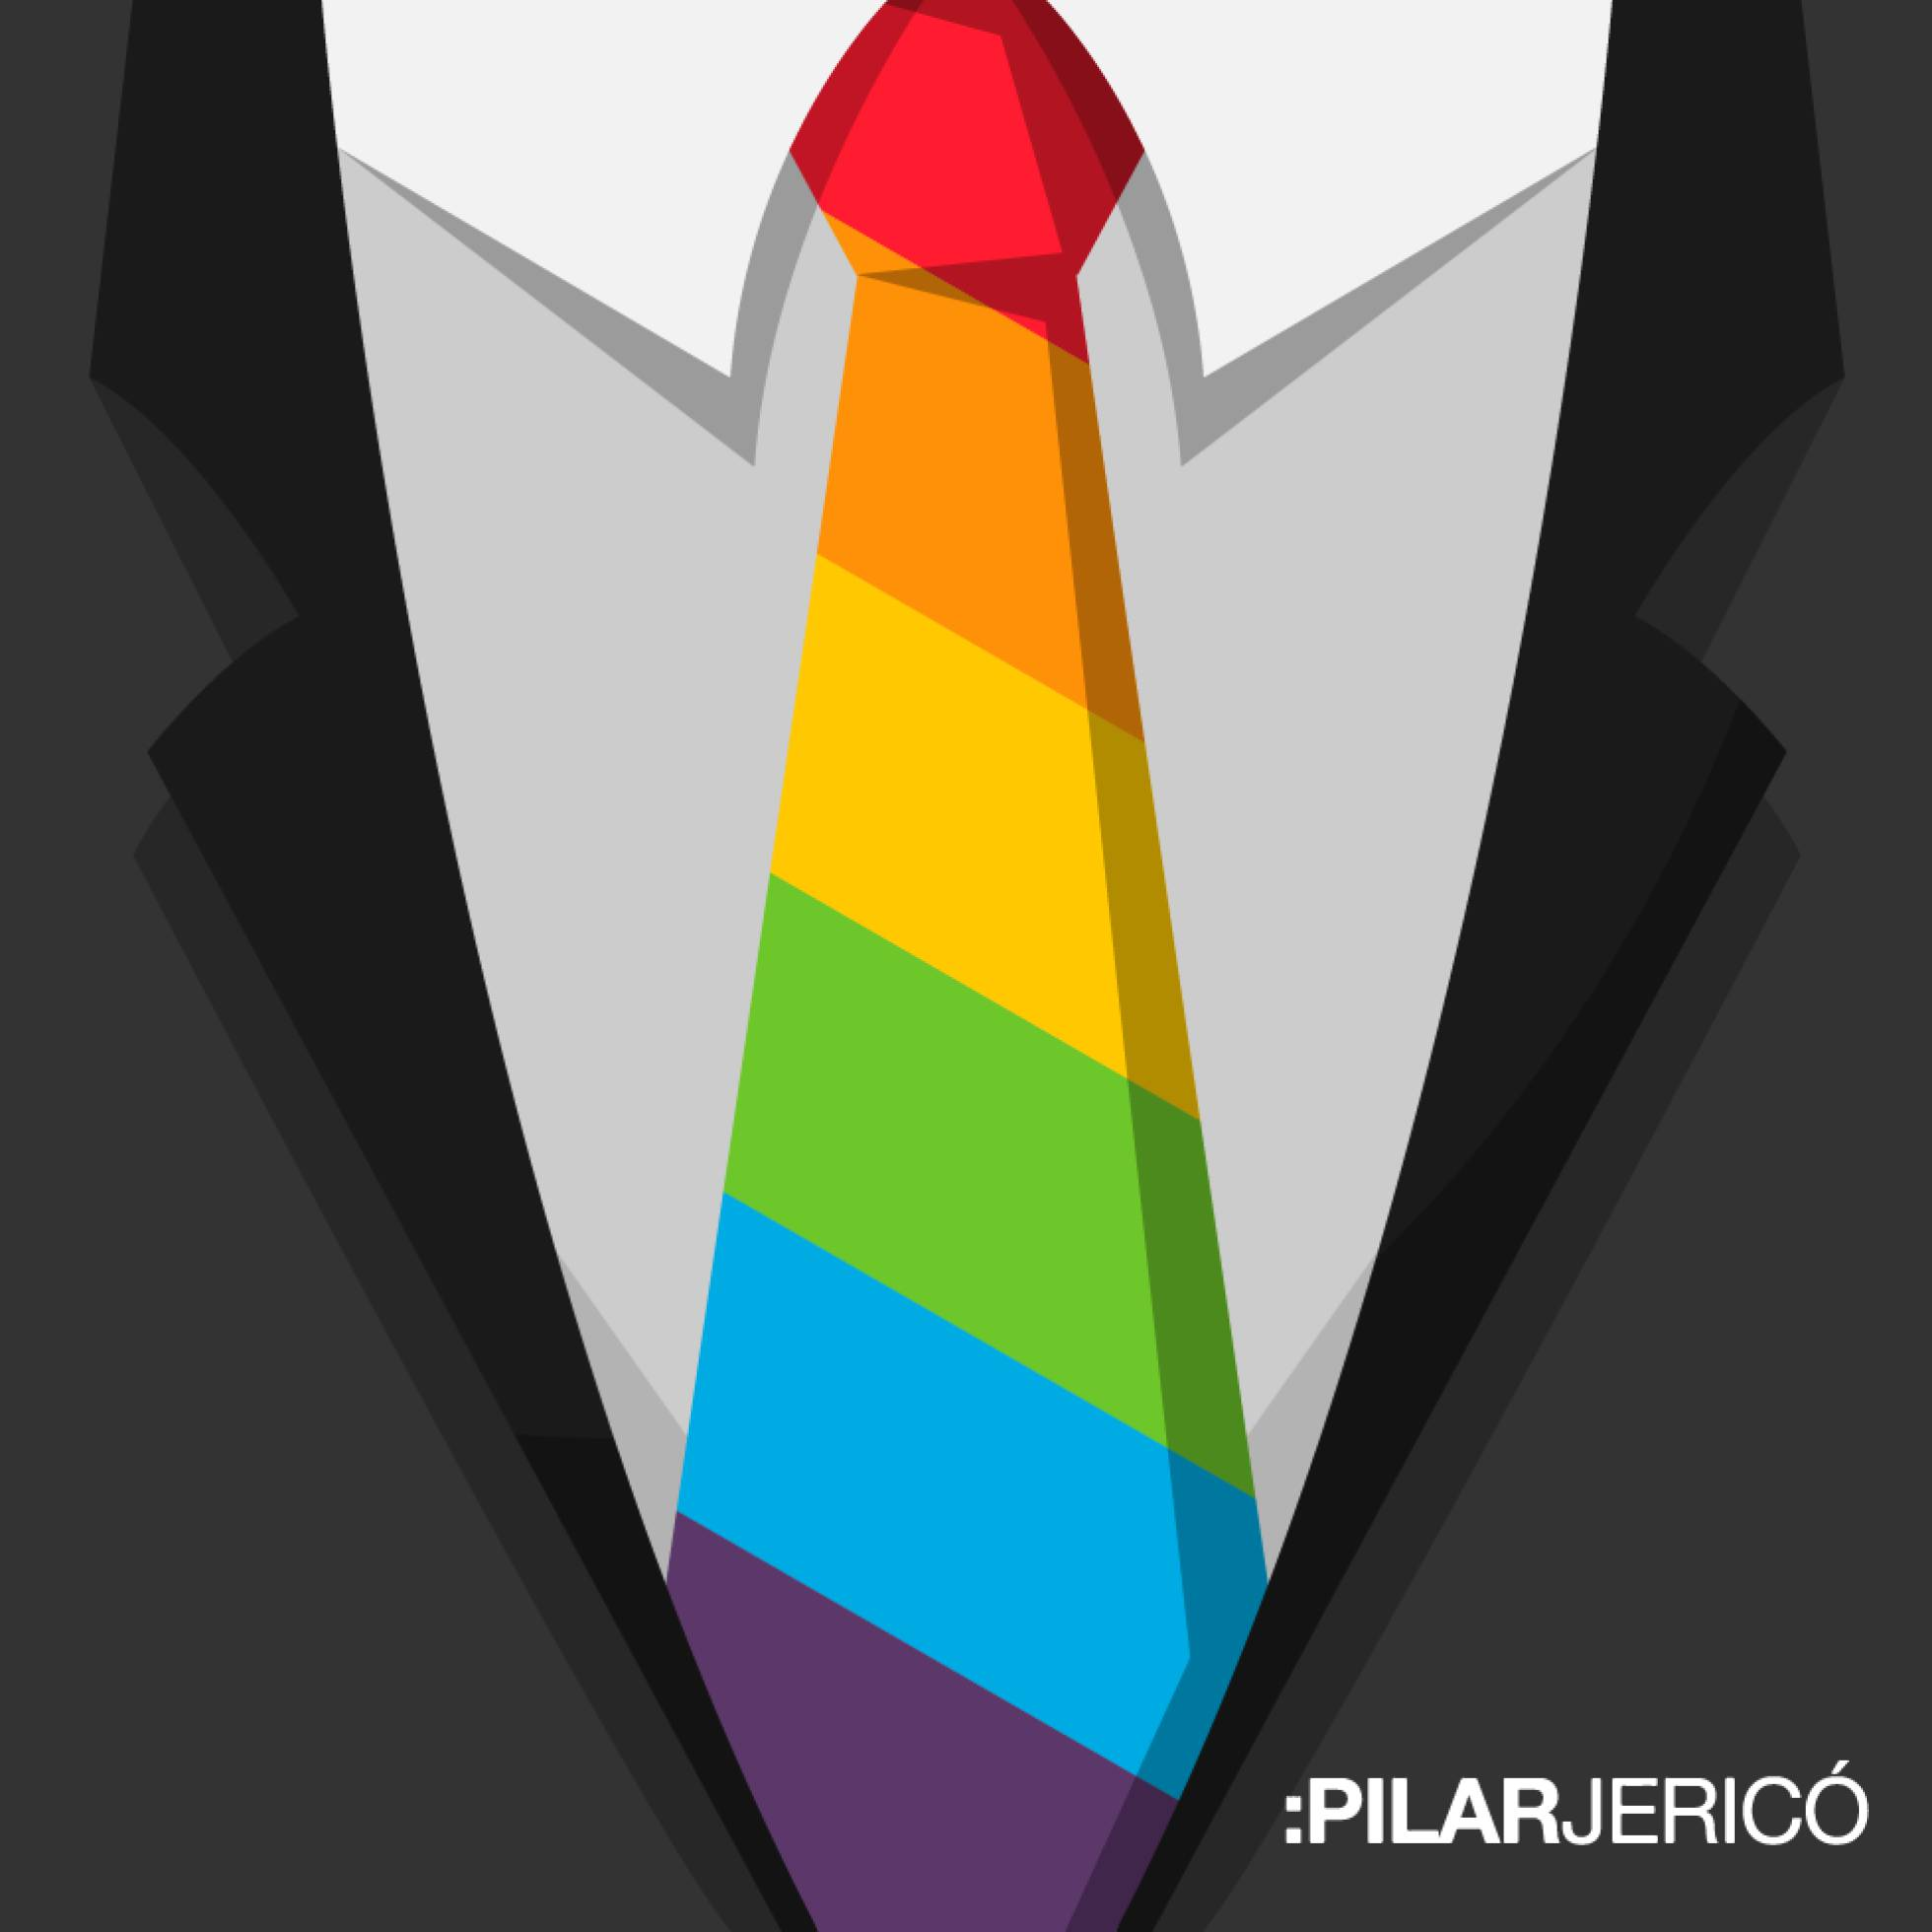 Pilar Jericó LGBTI LGTBI REDI